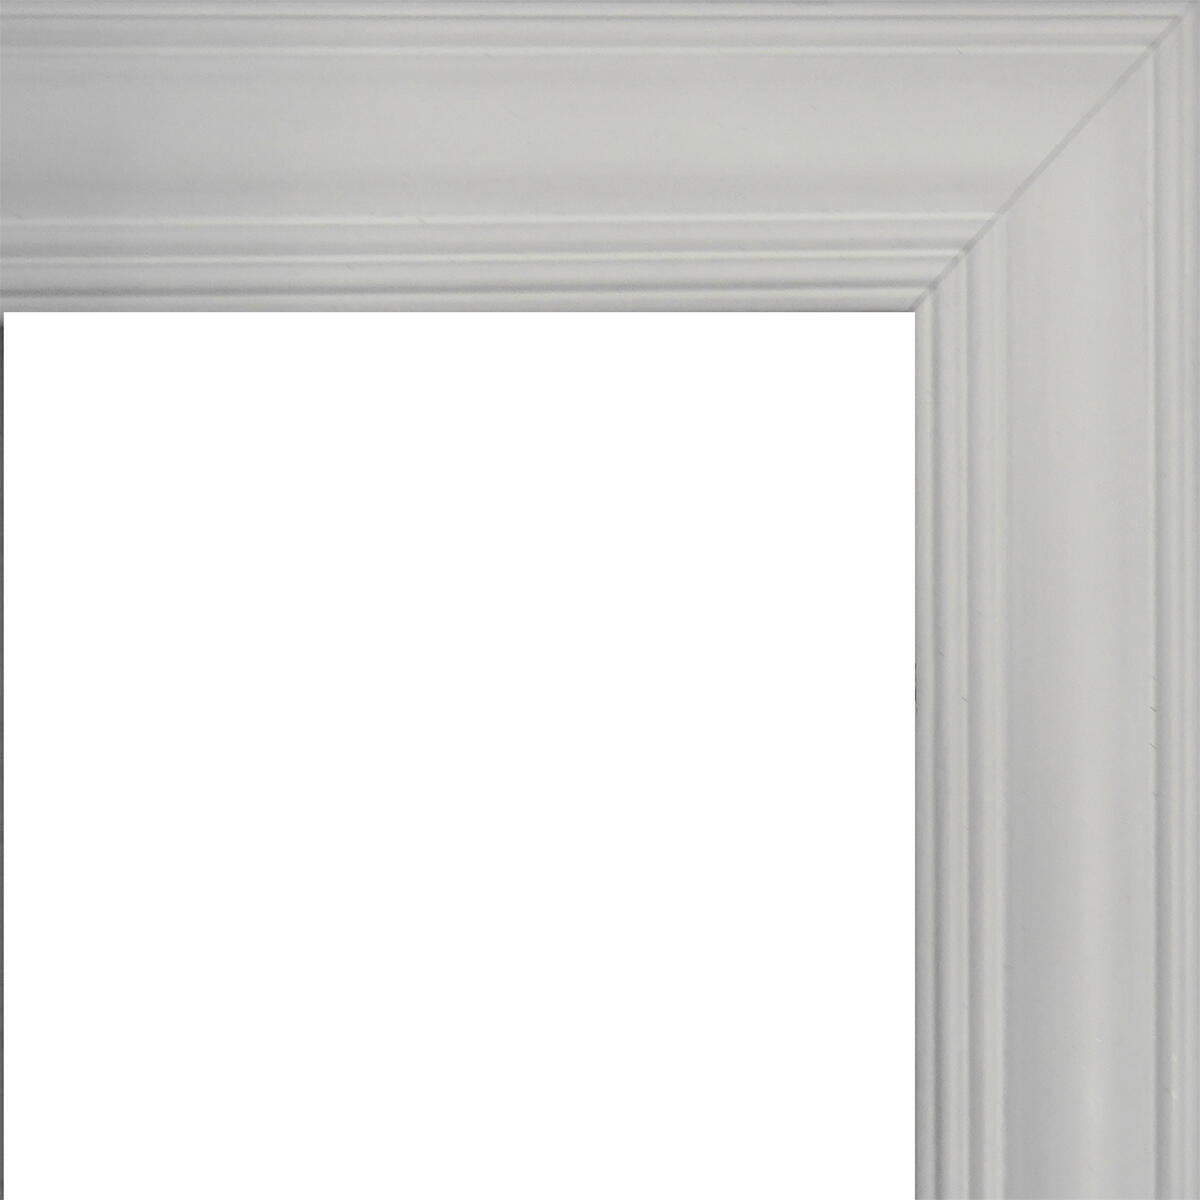 Cornice INSPIRE Louise bianco per foto da 29.7x42 cm - 4